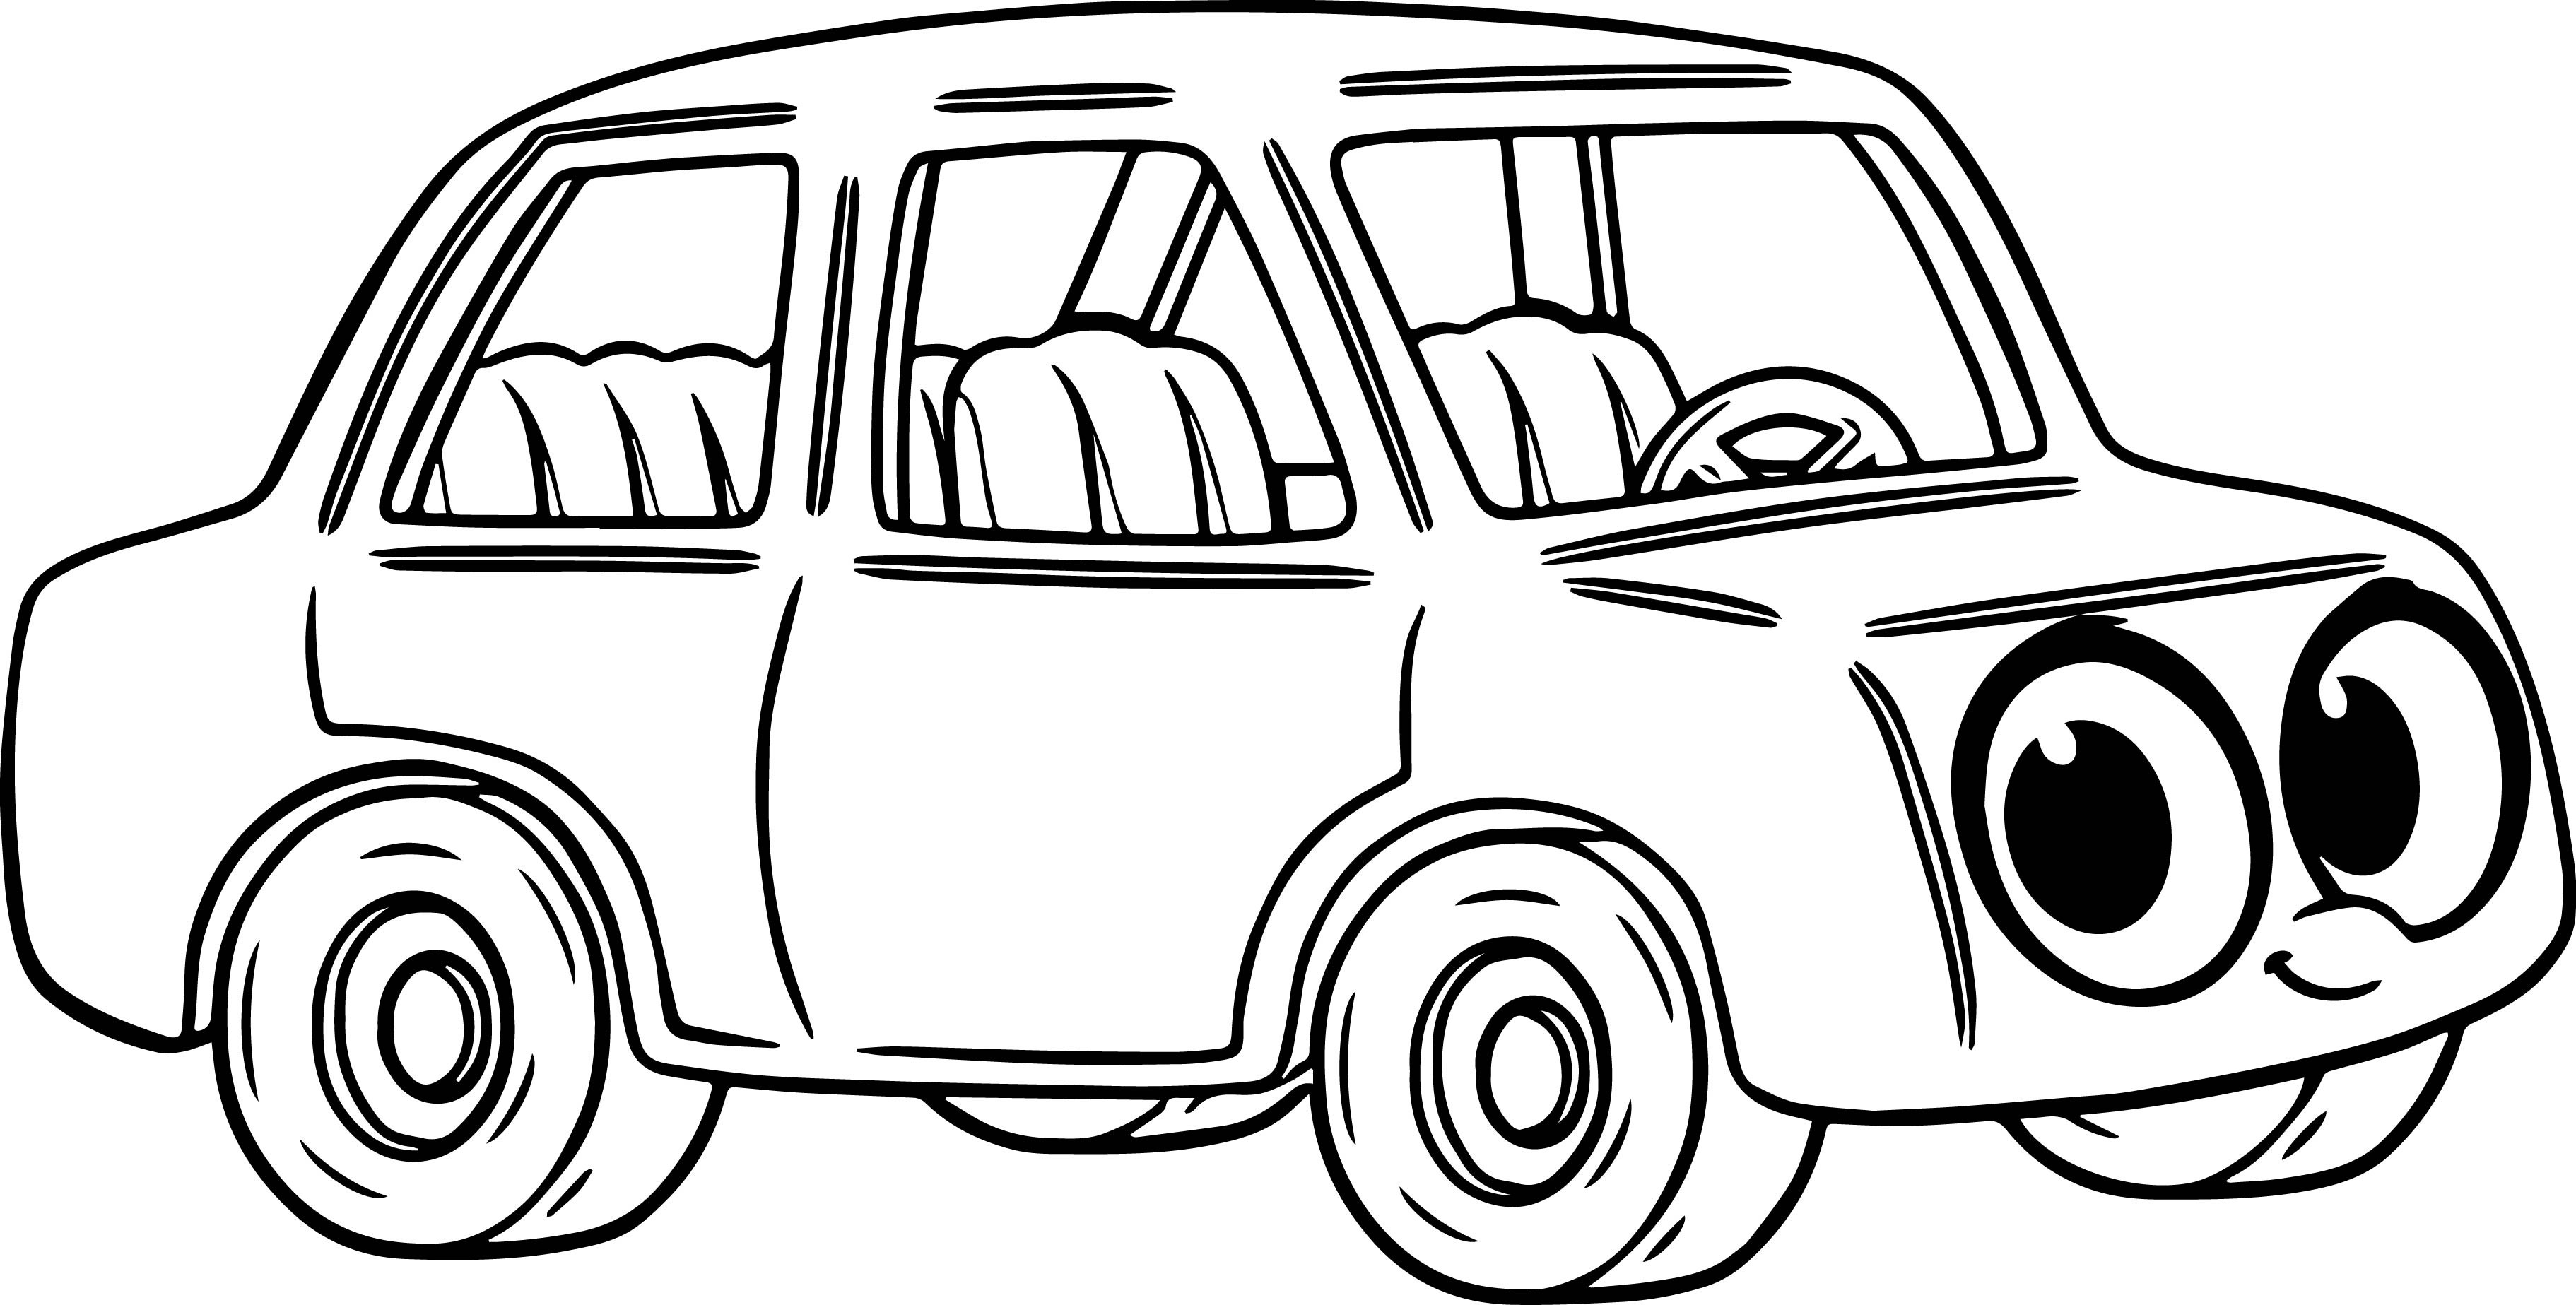 Car Cartoon Drawing at GetDrawings | Free download